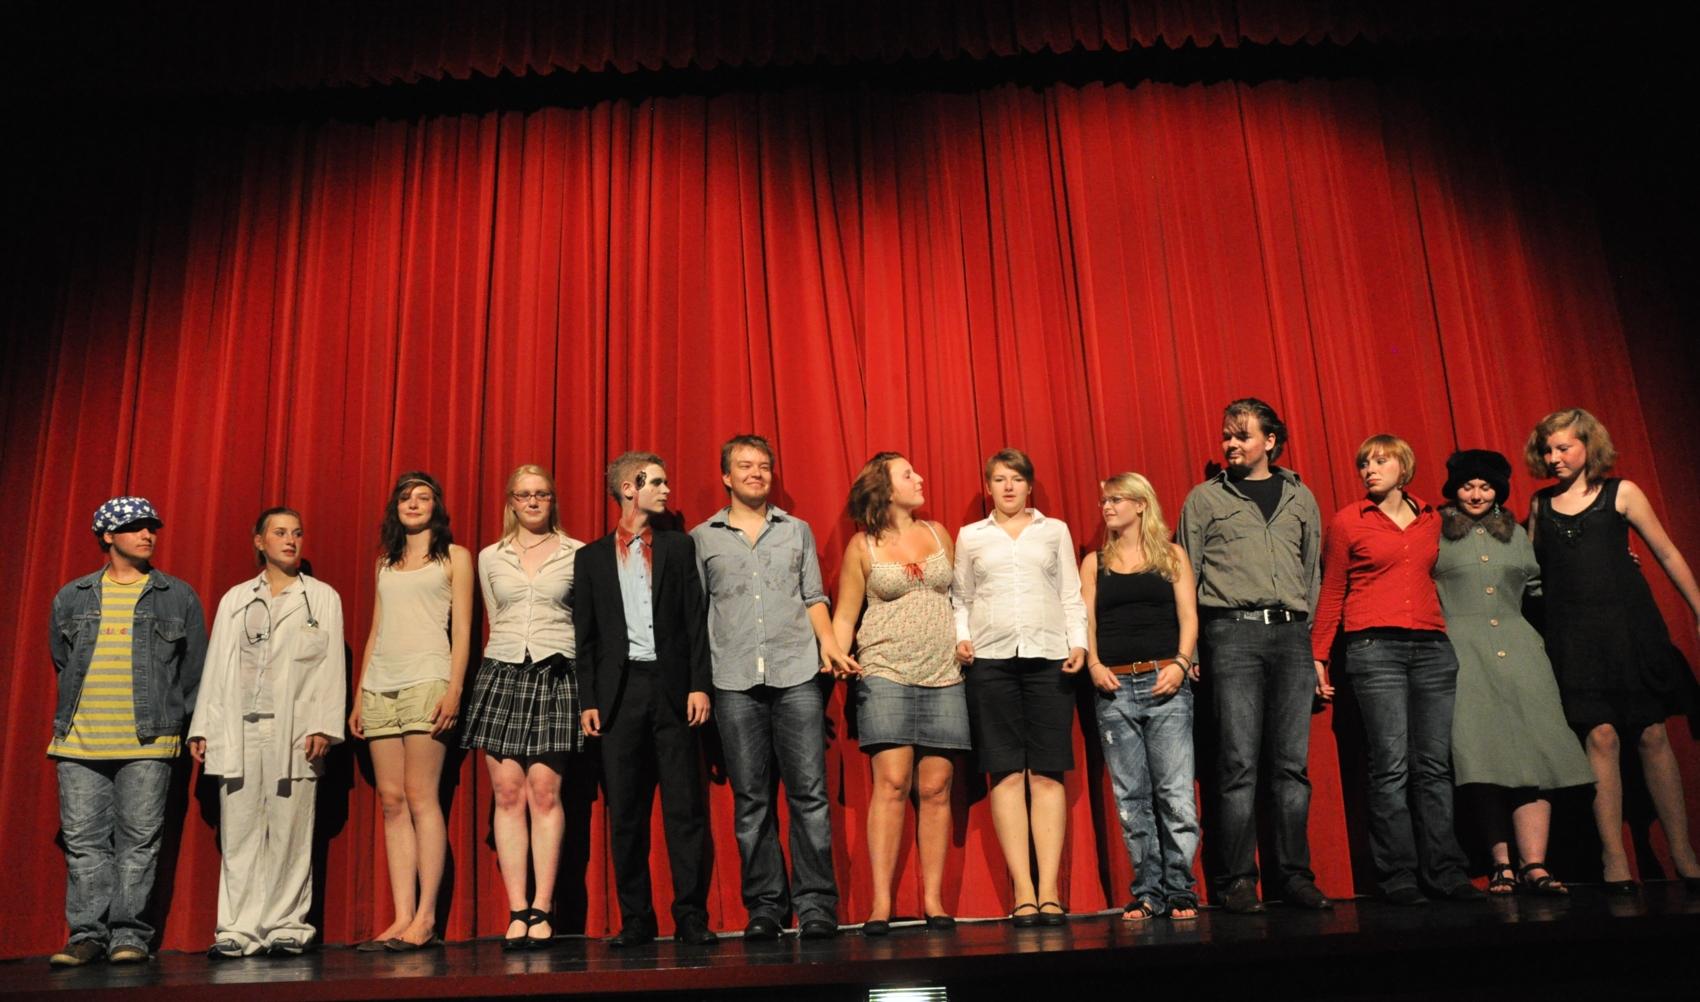 Das Ensemble